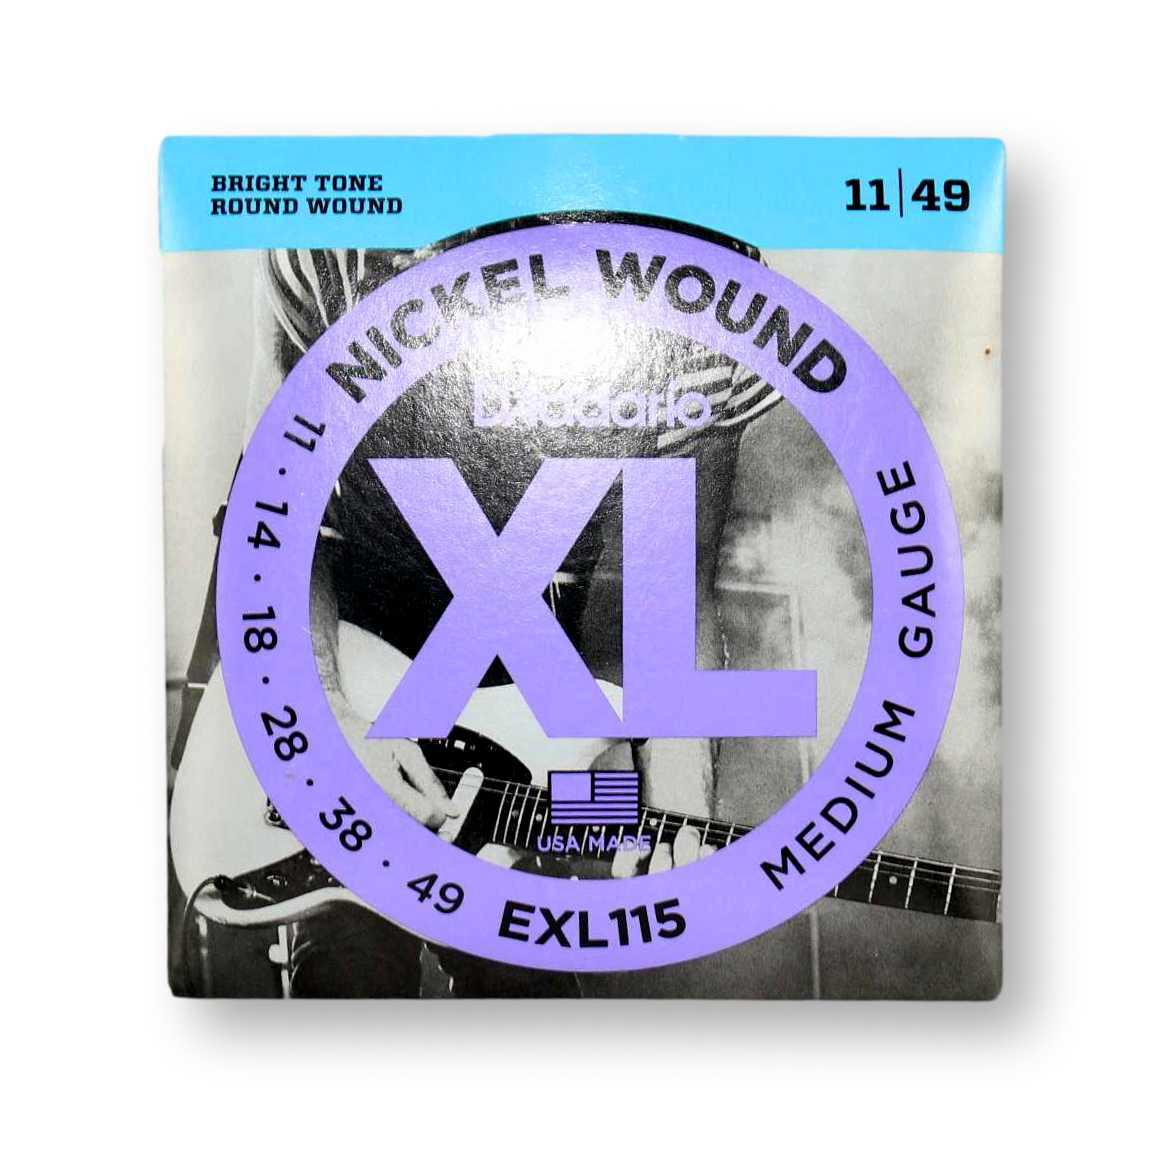 Encordoamento Guitarra Daddario 011 EXL115